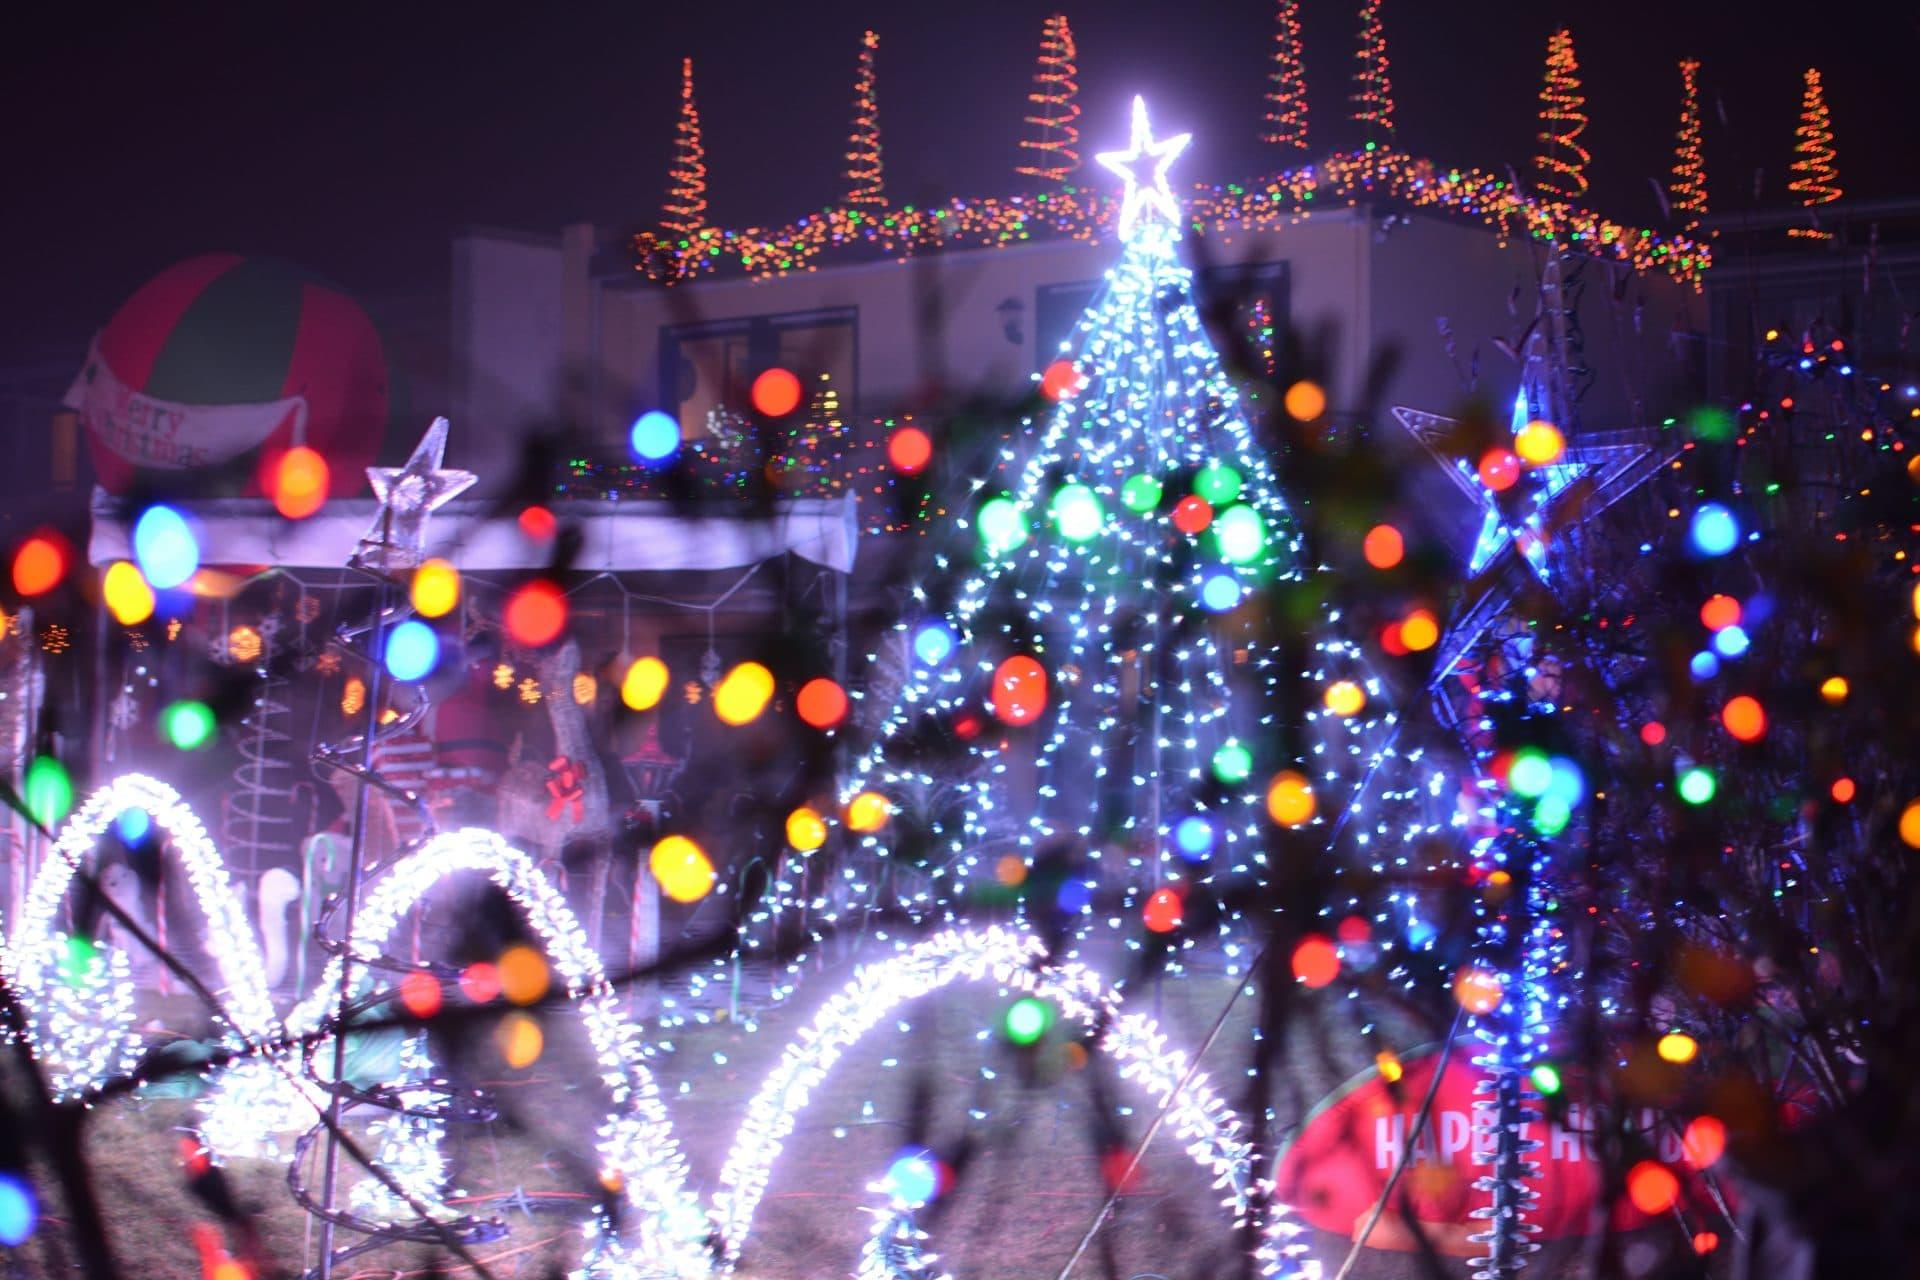 Bunte Weihnachtsbeleuchtung